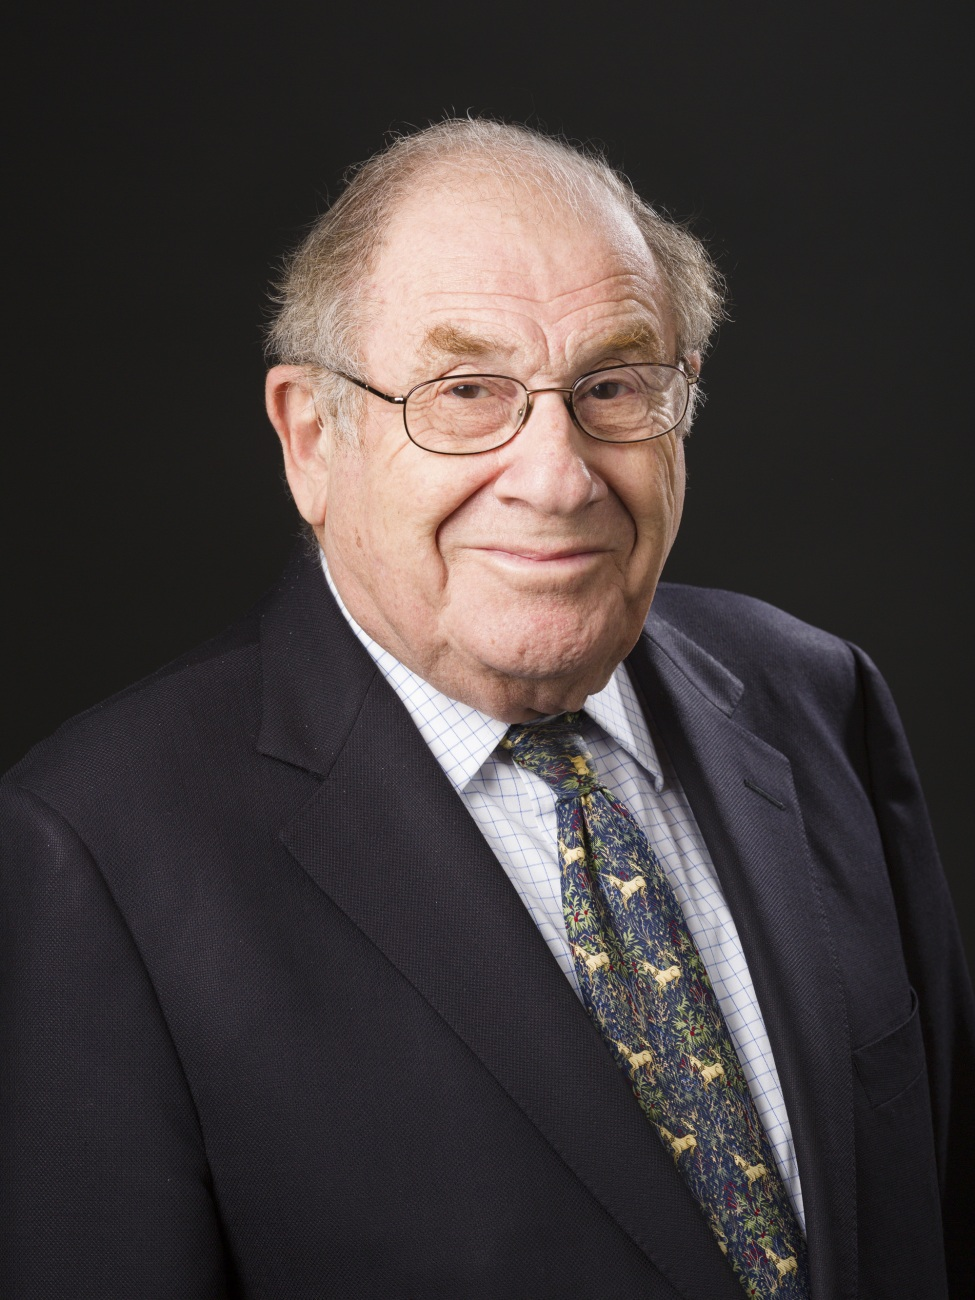 Irwin Braverman